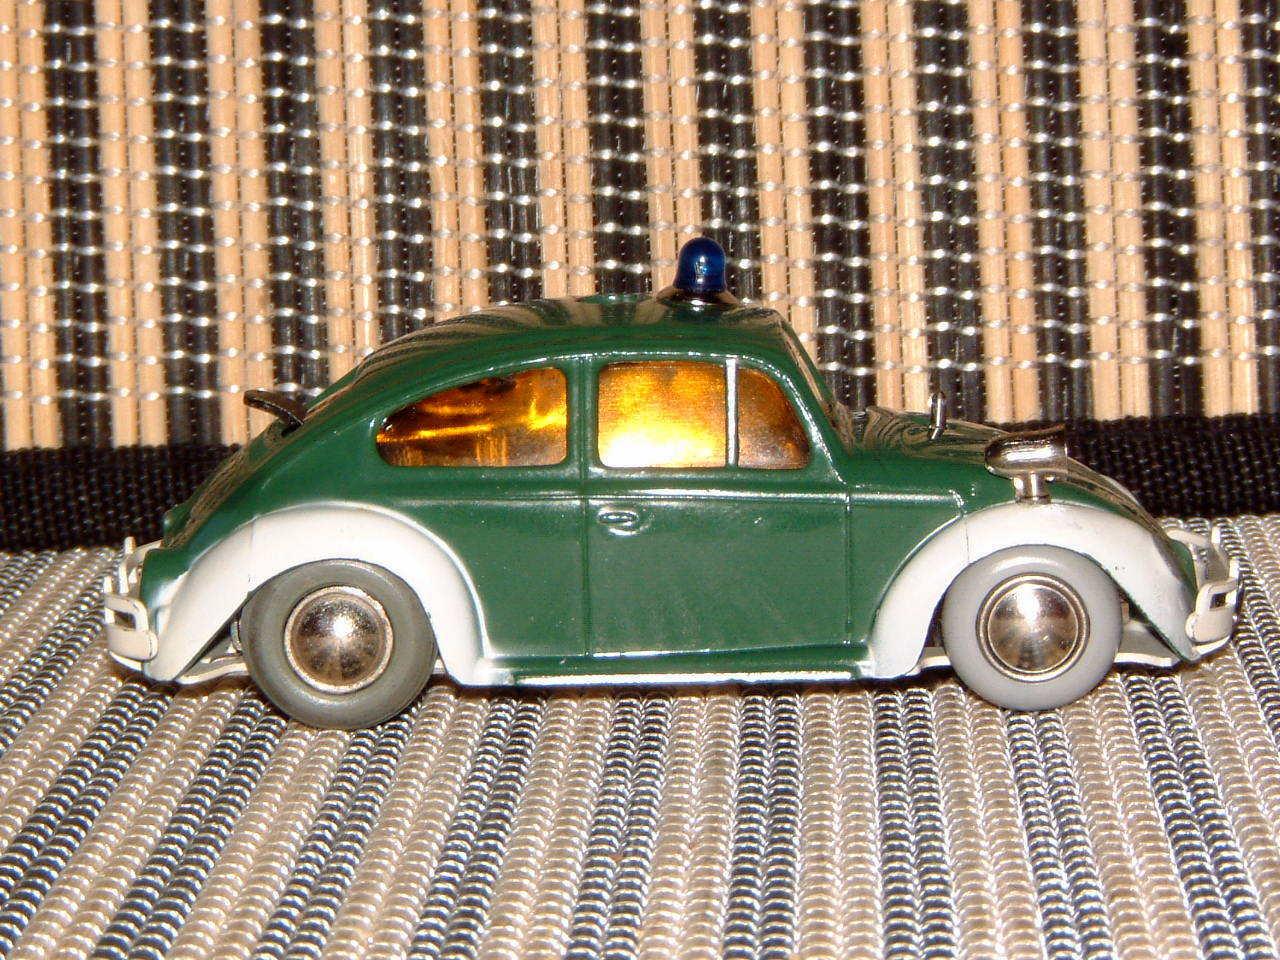 SCHUCO TELESTEERING VW POLICE BEETLE BEETLE BEETLE 3000, W PILLARS, KEY, STEERING WHEEL, BOX + 5e51b9